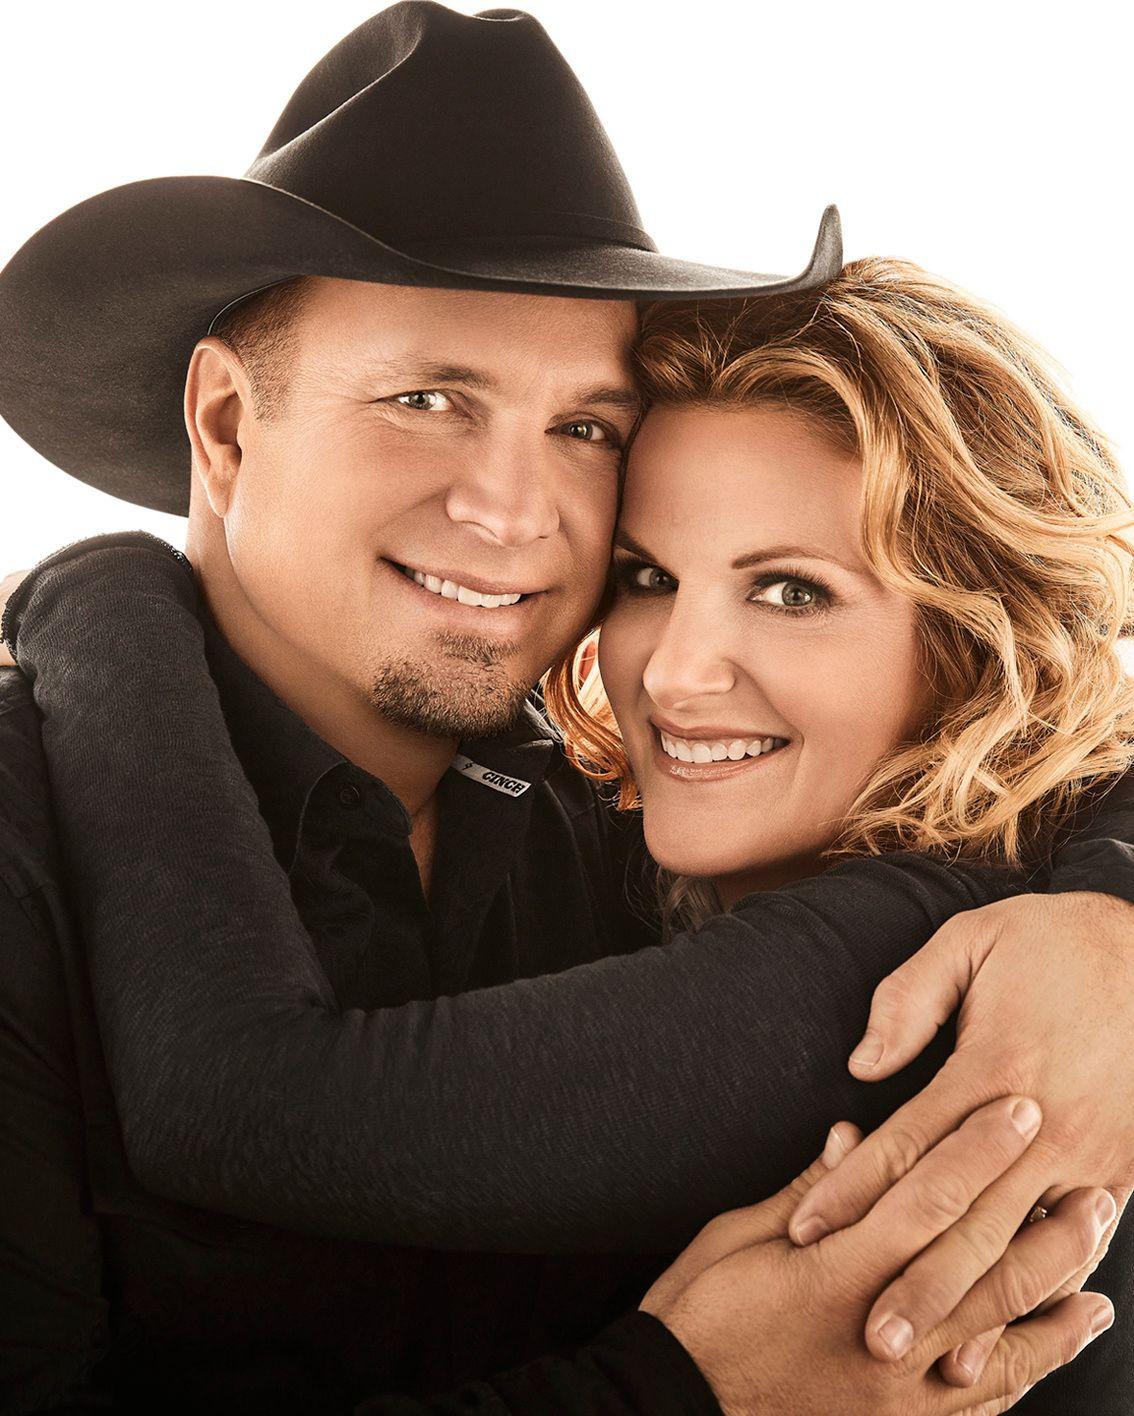 Garth Brooks and Trisha Yearwood embracing